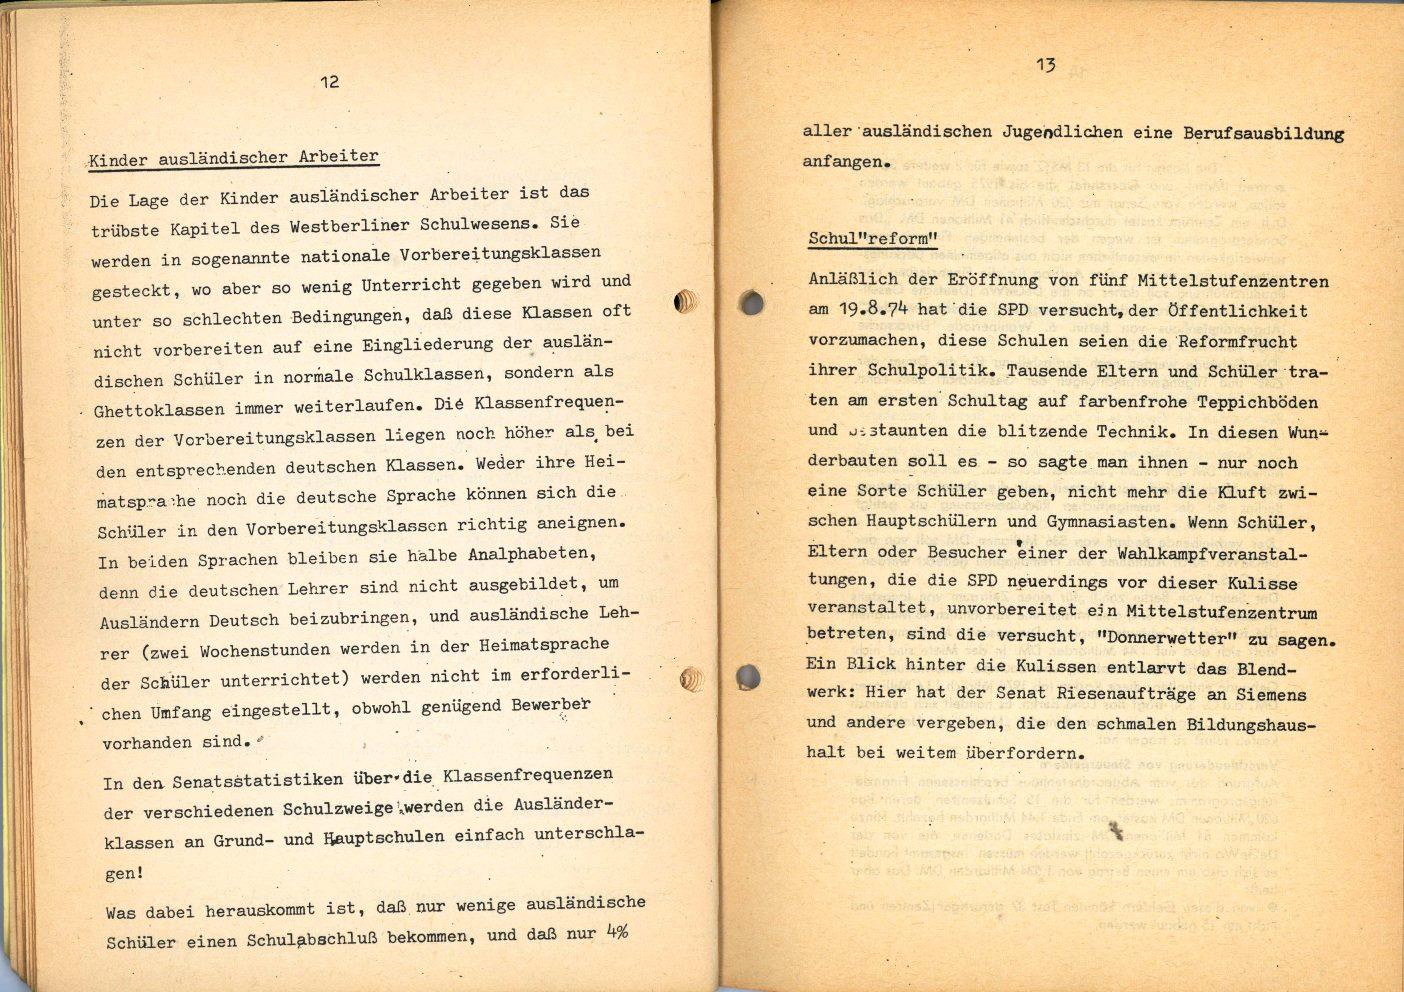 Berlin_SMV_GUV_1974_Schulmisere_09